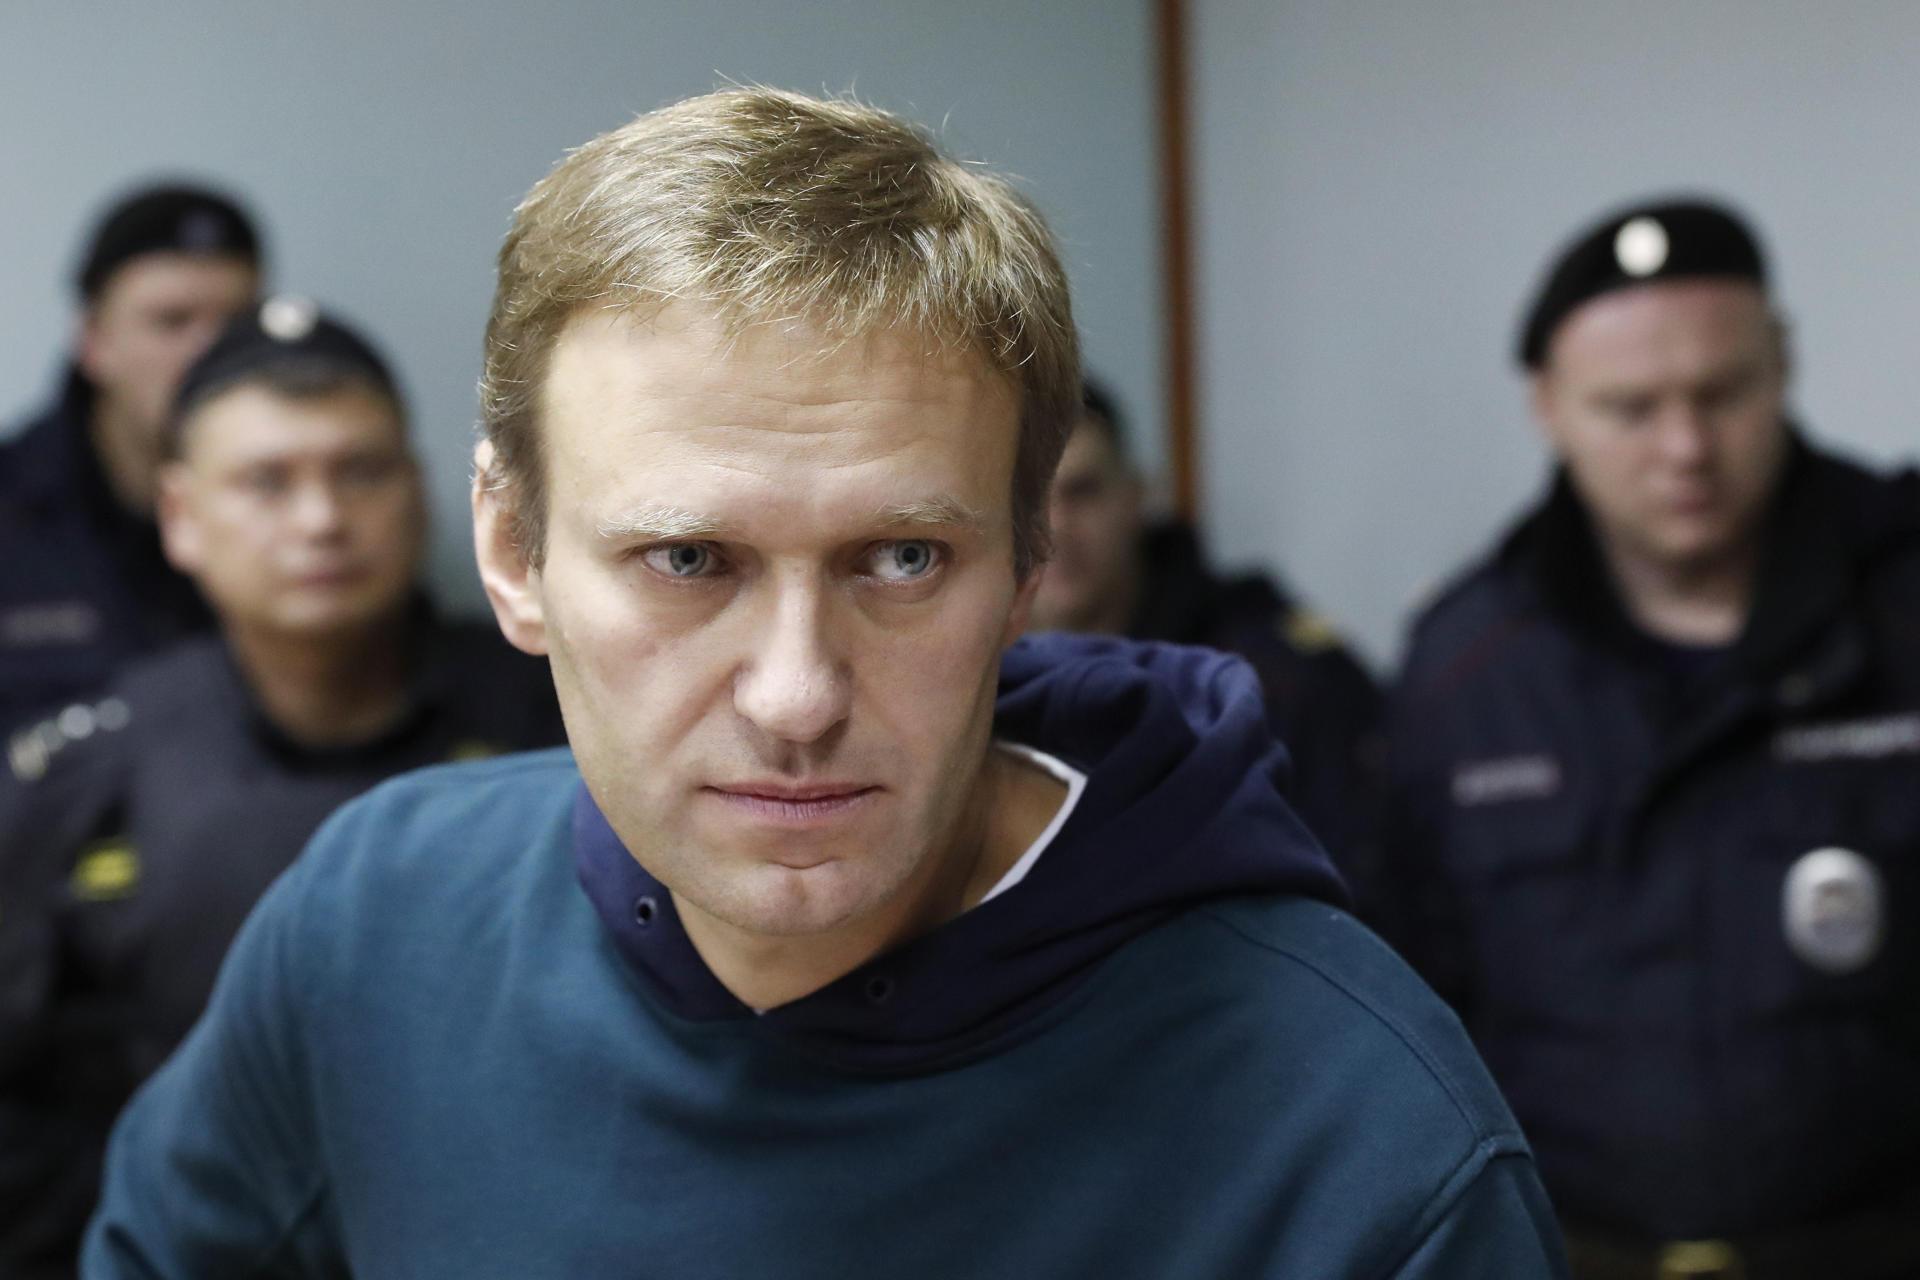 Berlin confirme l'empoisonnement de l'opposant russe Alexeï Navalny